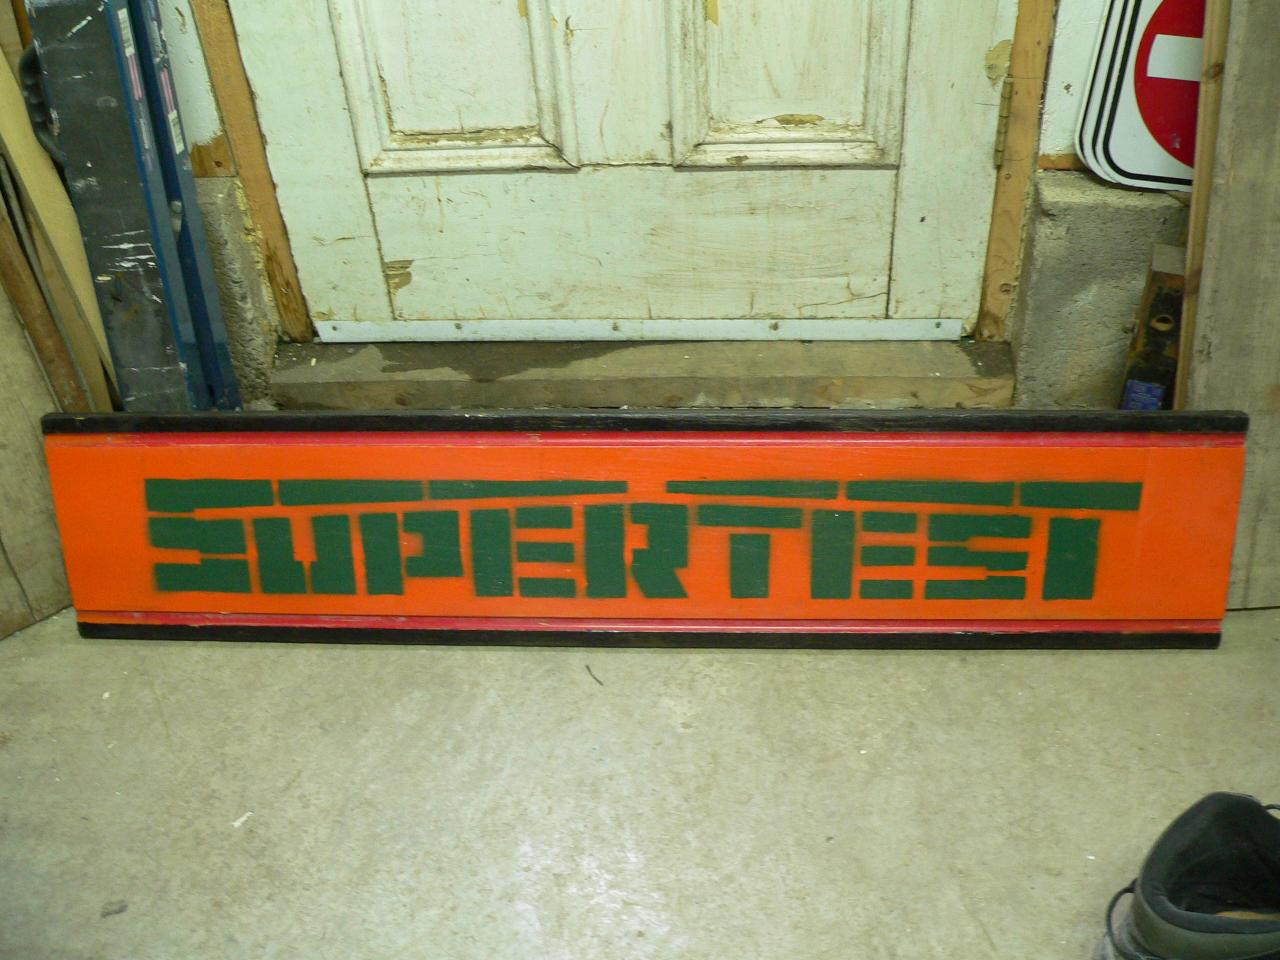 Annonce supertest #3935